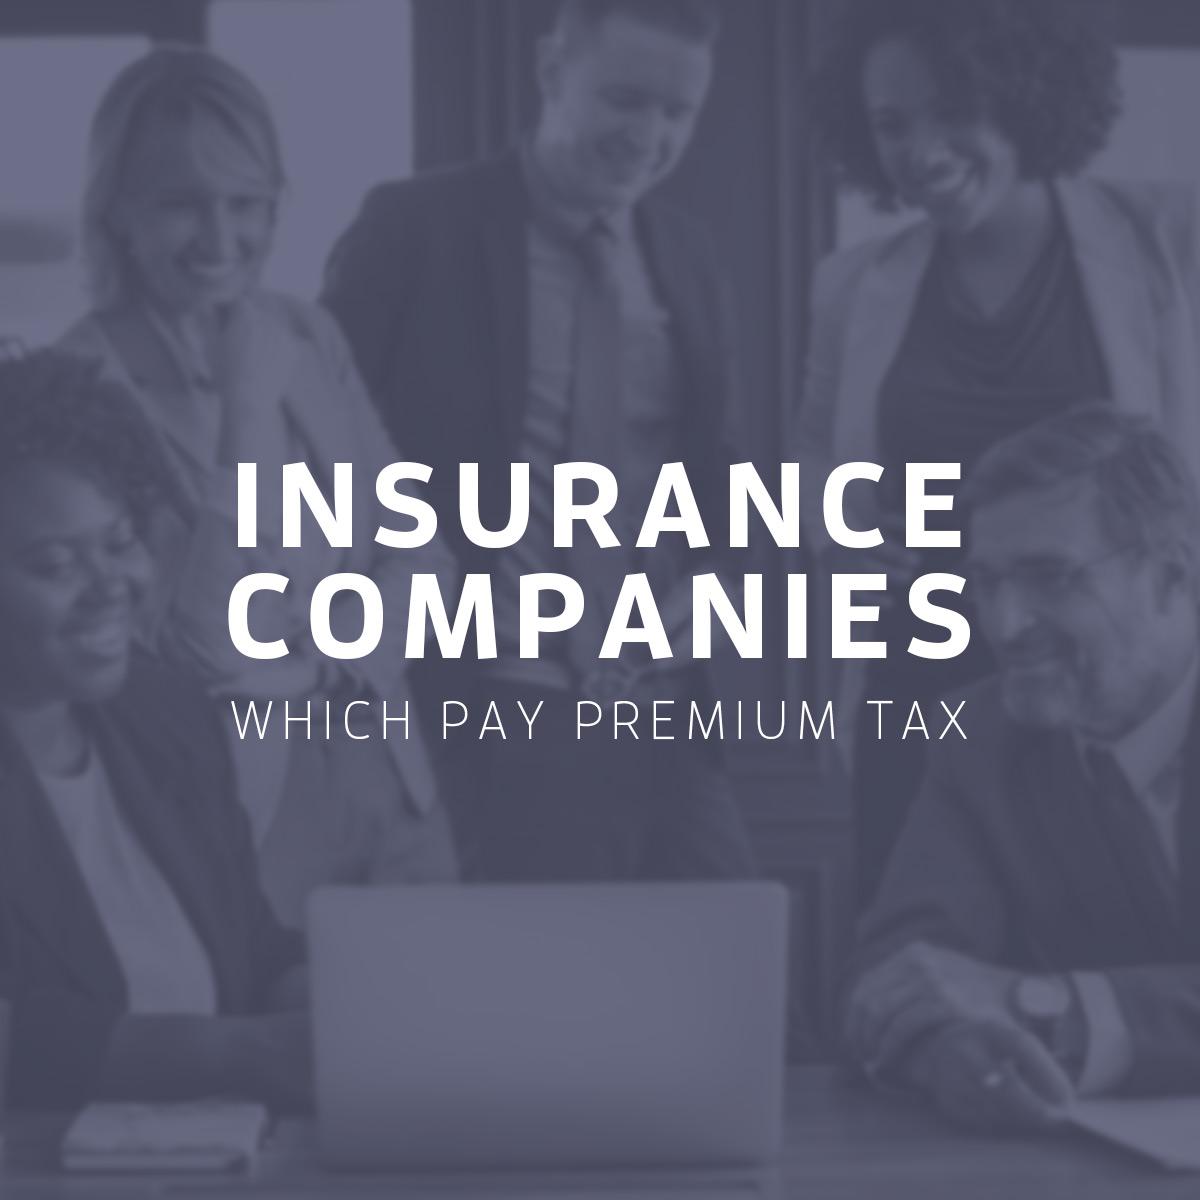 1-INS Companies - Txt.jpg